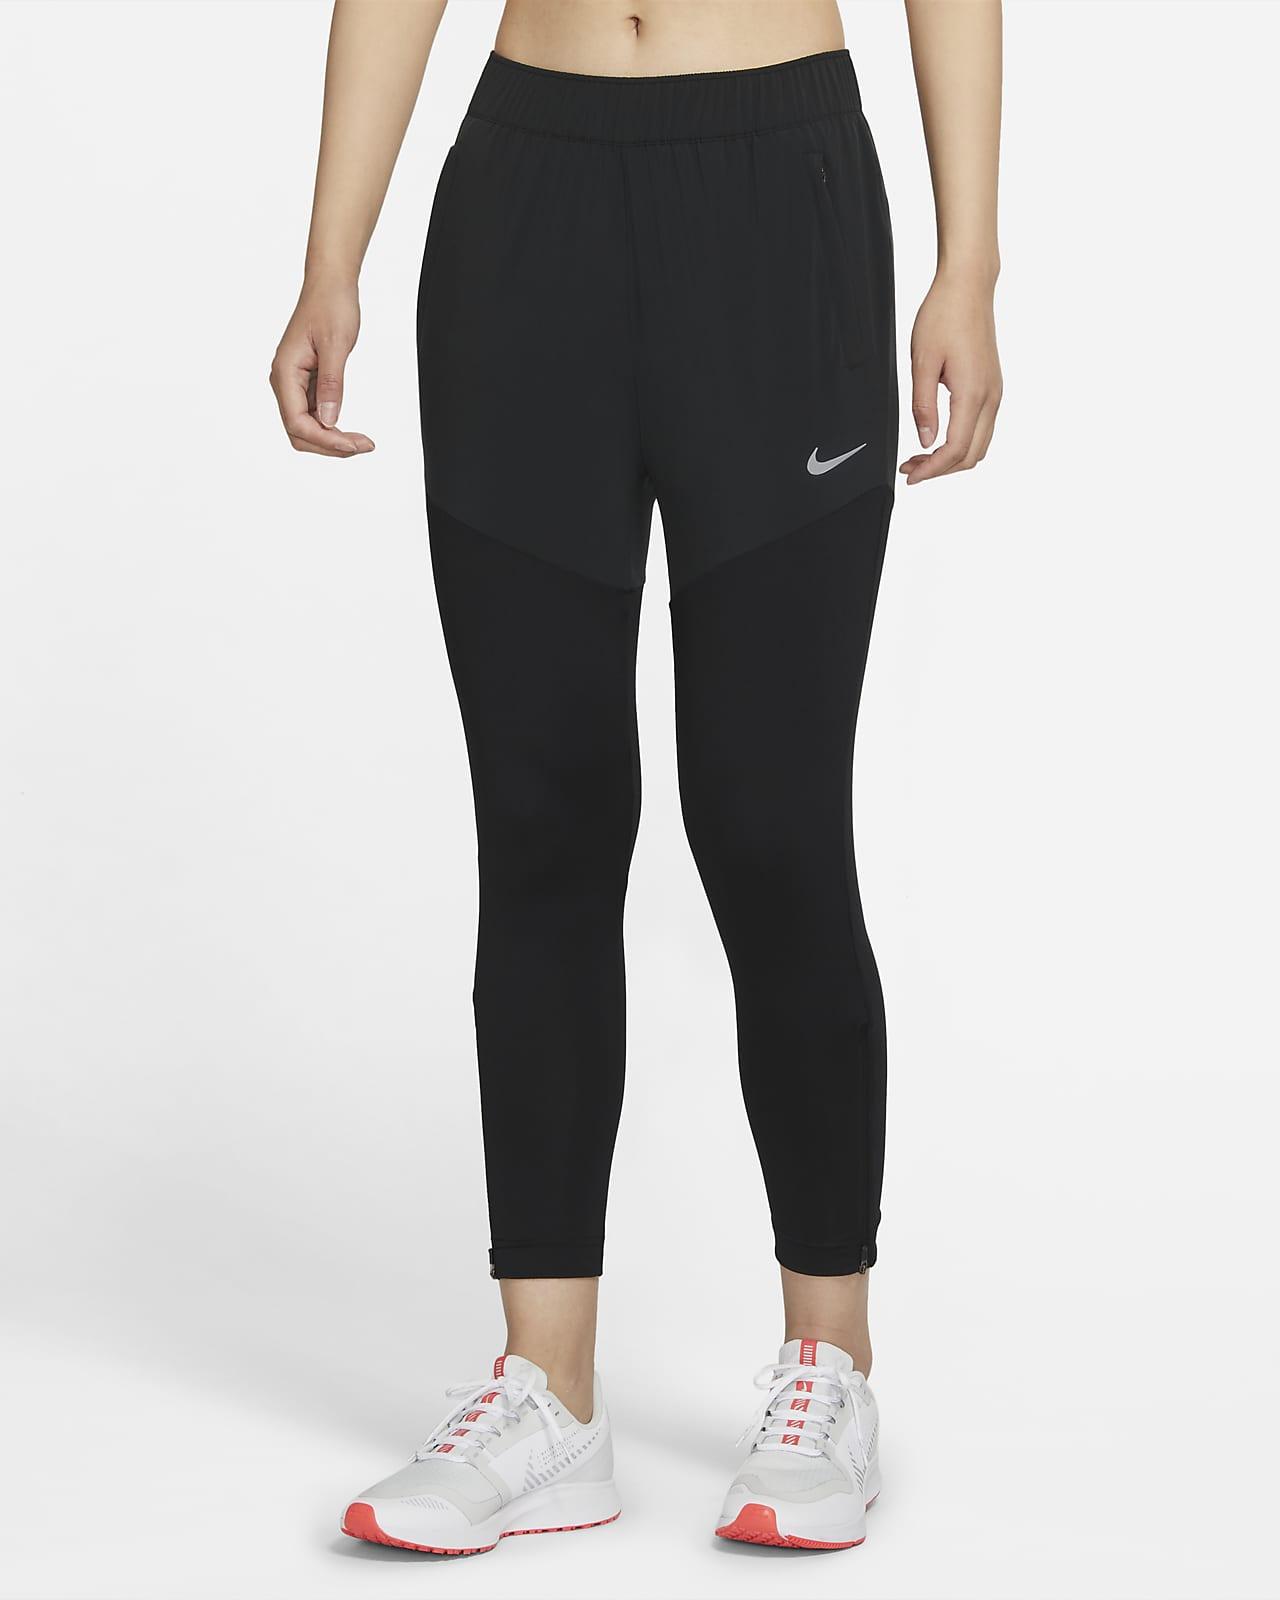 Nike Dri-FIT Essential Women's Running Pants